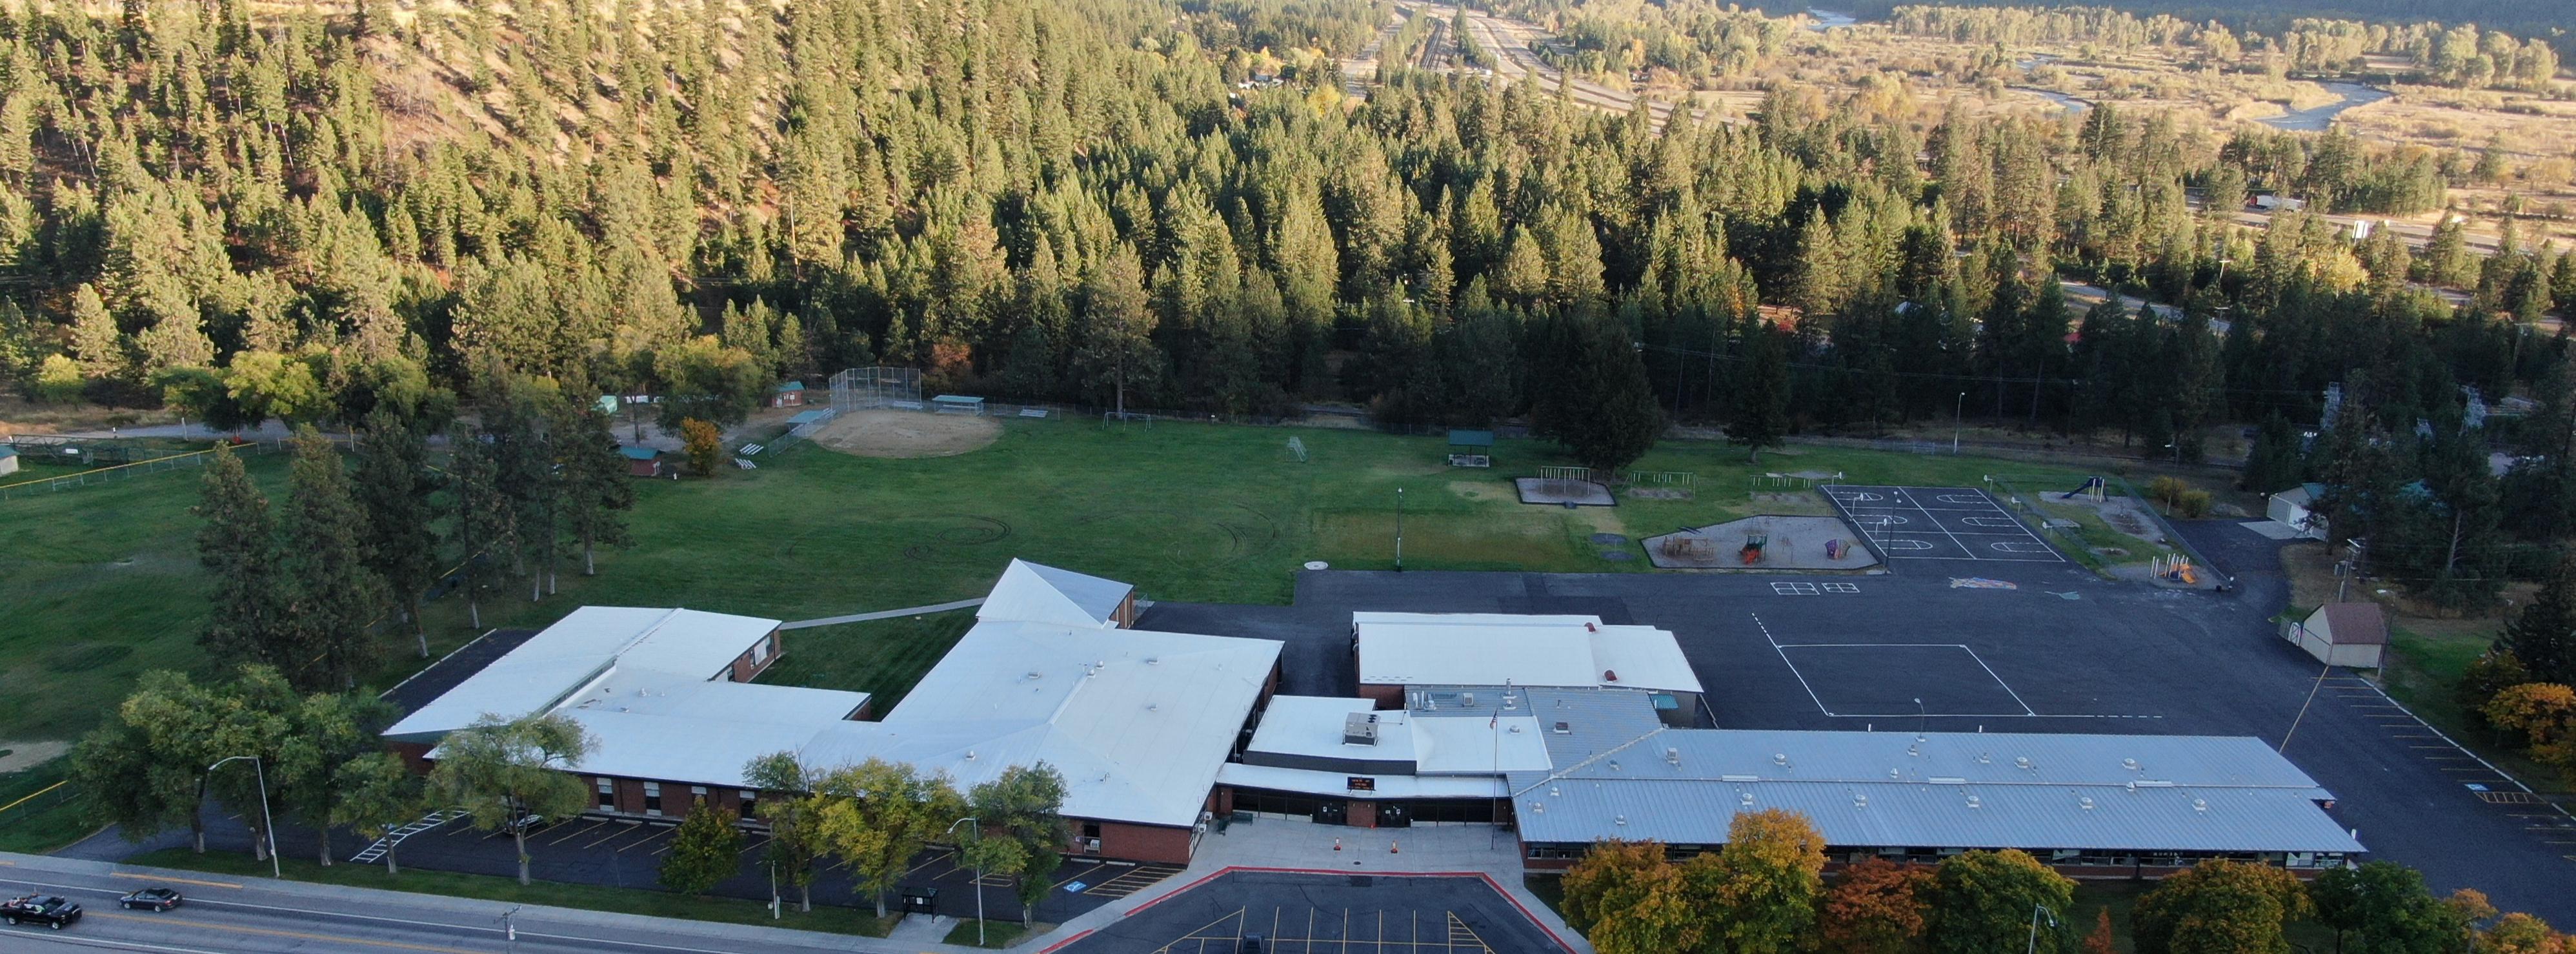 Aerial view of Bonner school building